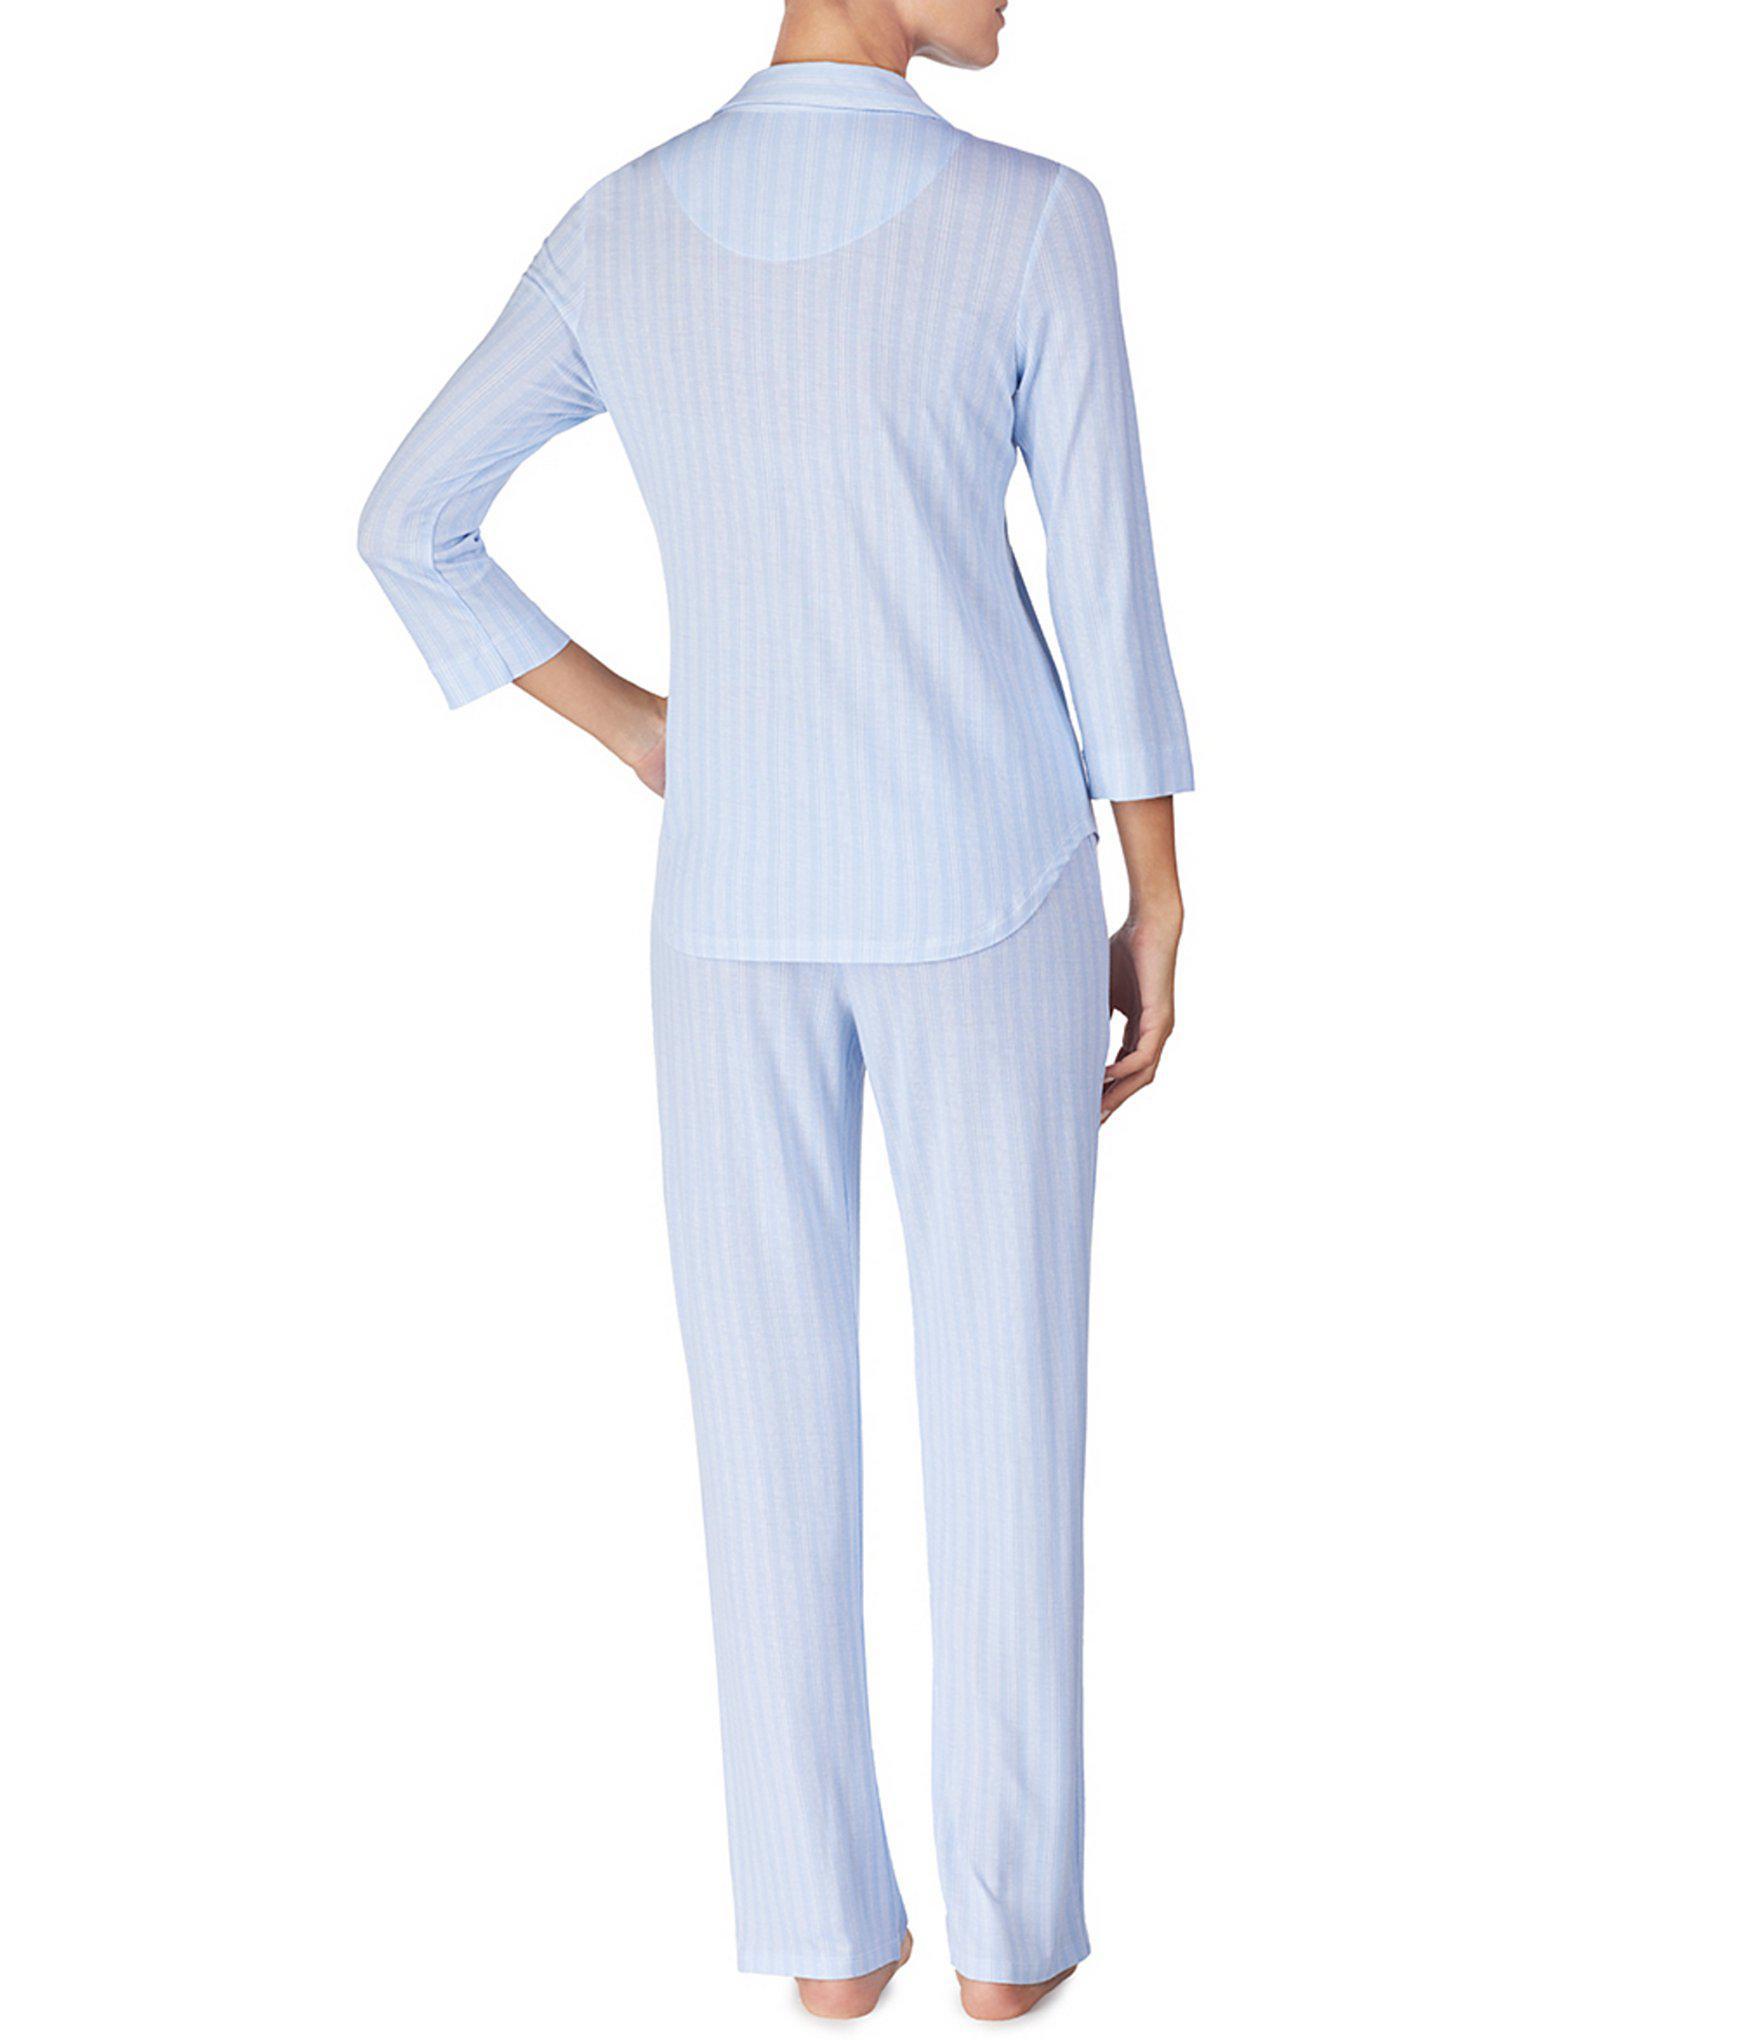 Lauren by Ralph Lauren - Blue Petite Striped-print Jersey Knit Pajamas -  Lyst. View fullscreen 210f9e359